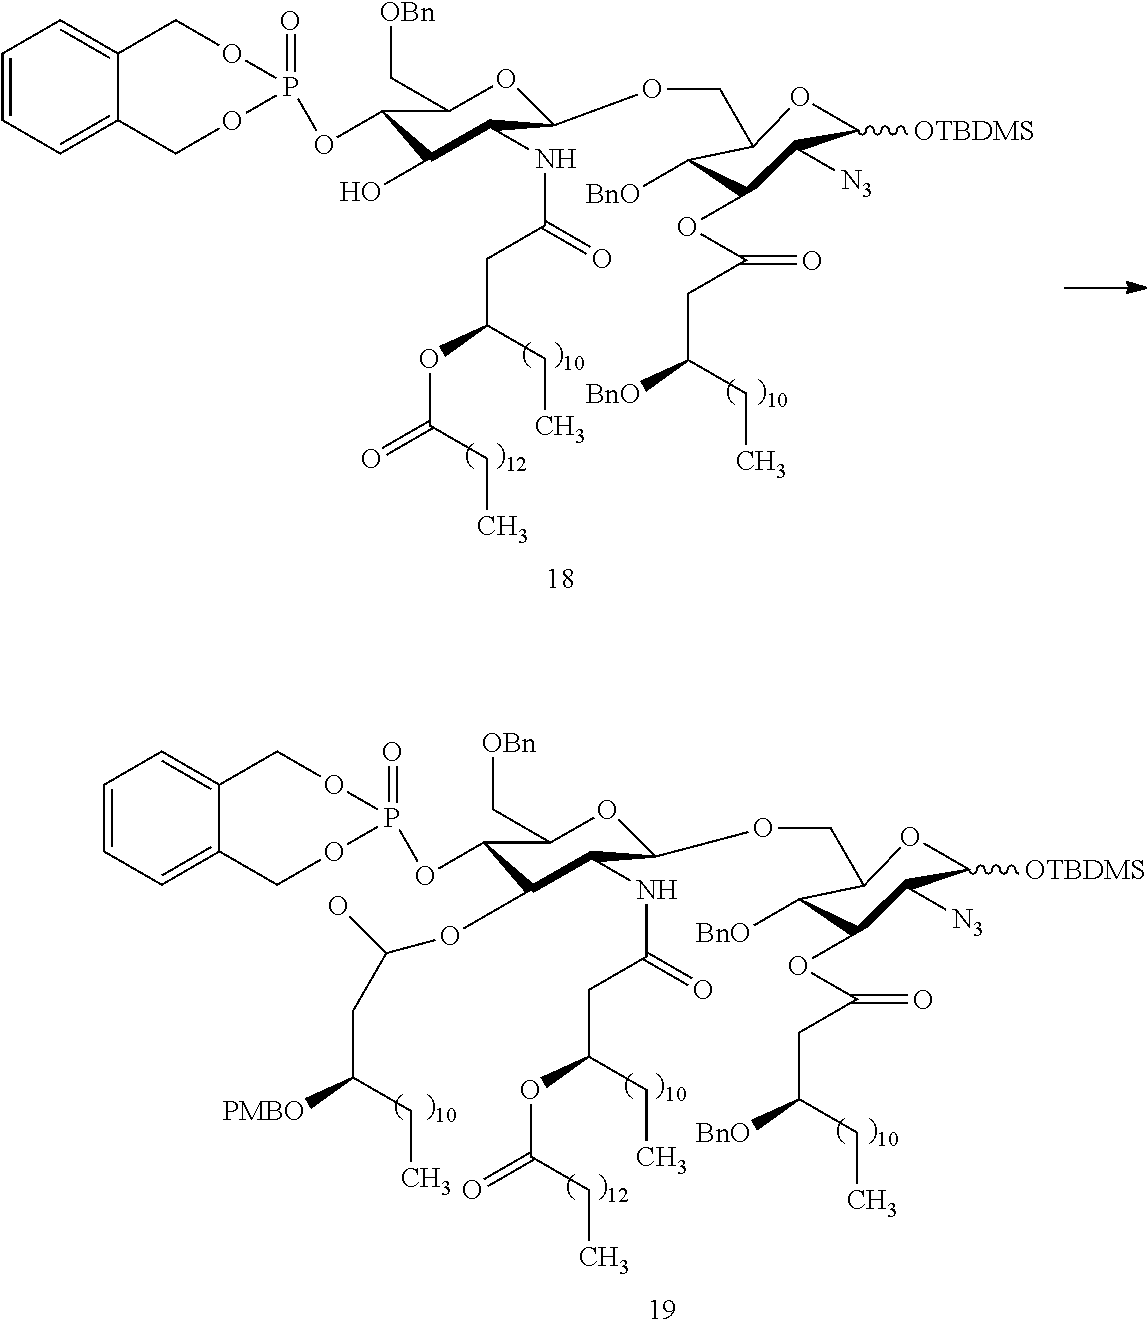 Us9480740b2 Synthetic Glucopyranosyl Lipid Adjuvants Google Patents Wiring Diagram Hornet 740t Figure Us09480740 20161101 C00031